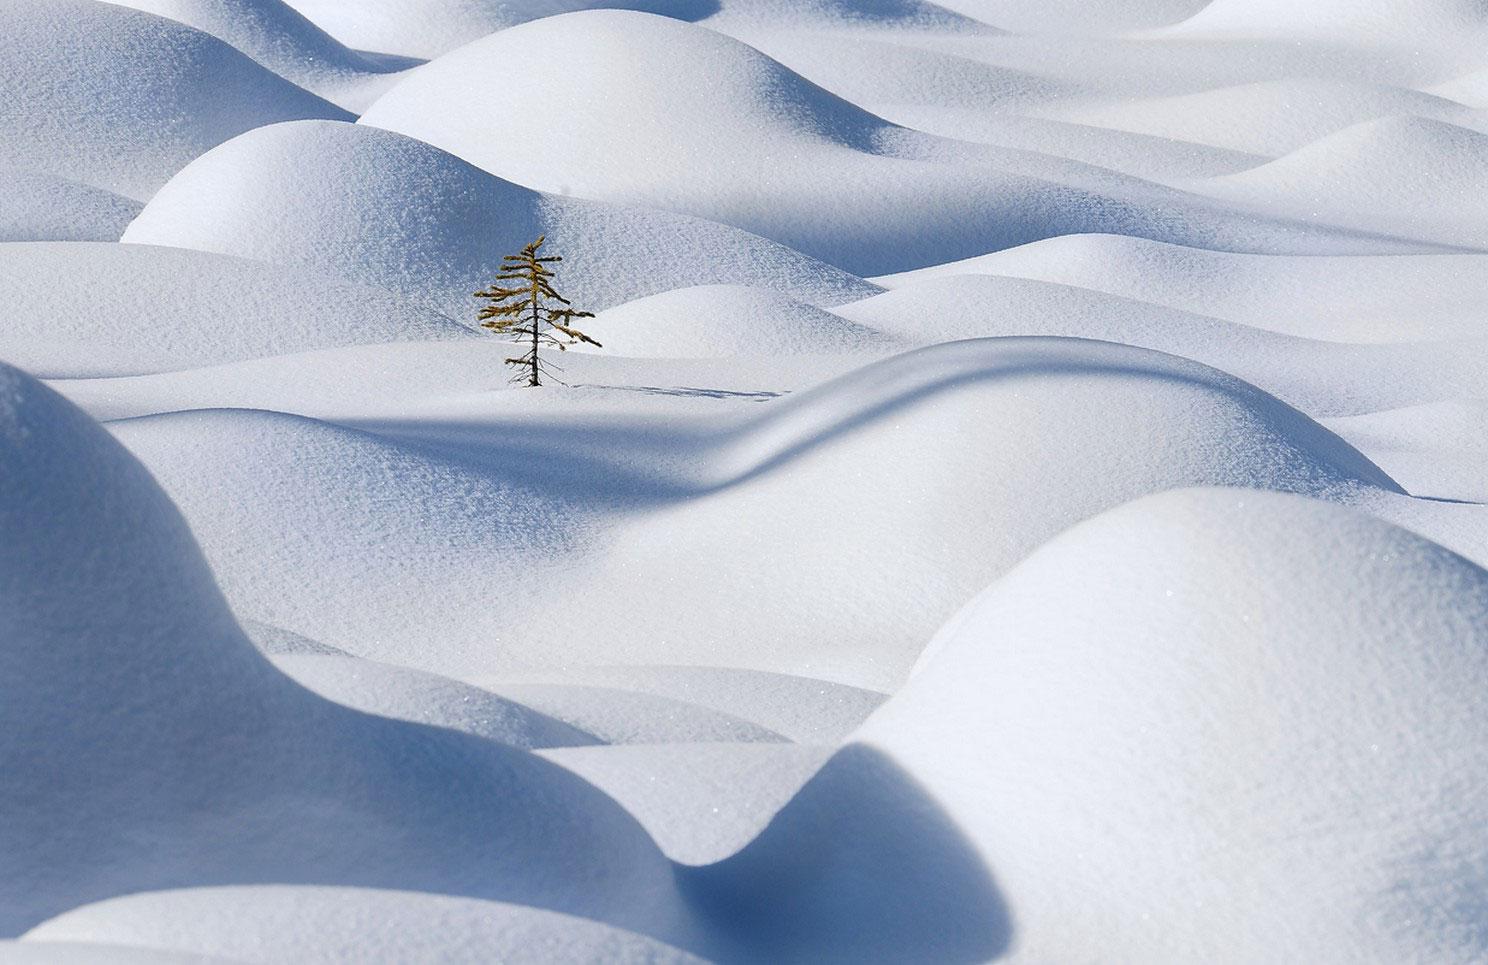 дерево среди сугробов